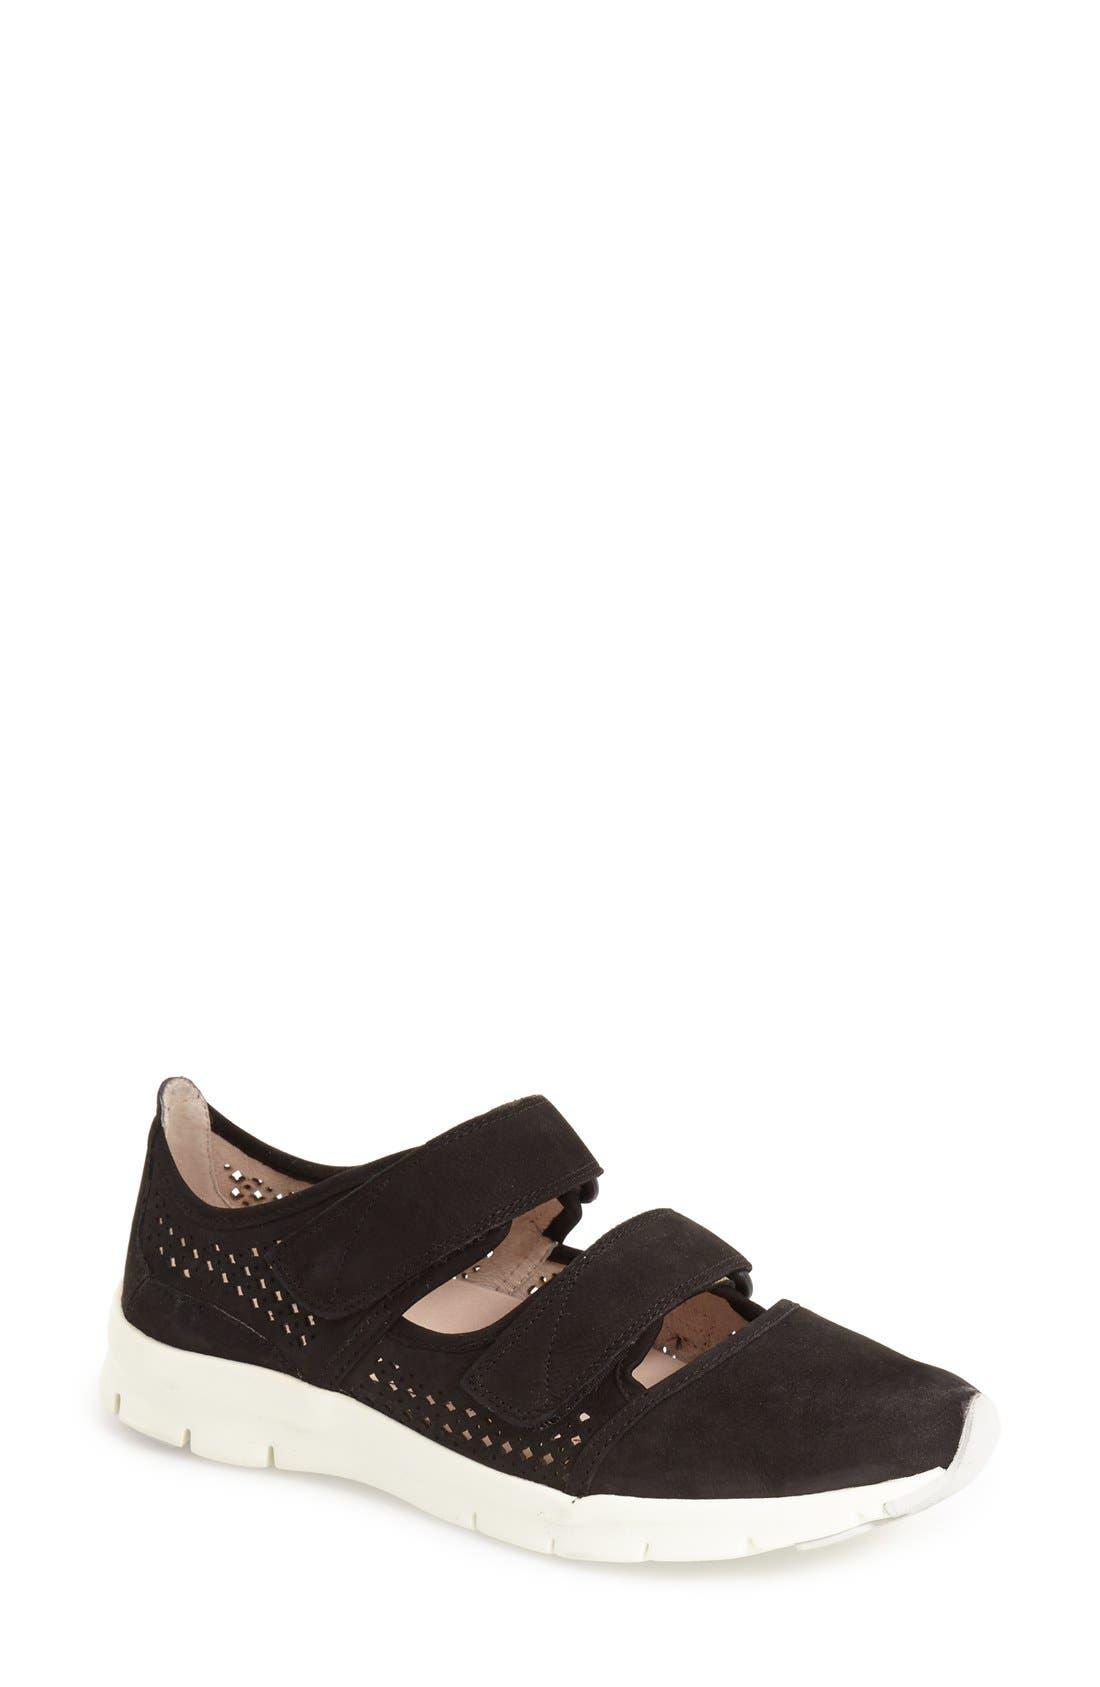 SUDINI Tacy Slip-On Leather Sneaker